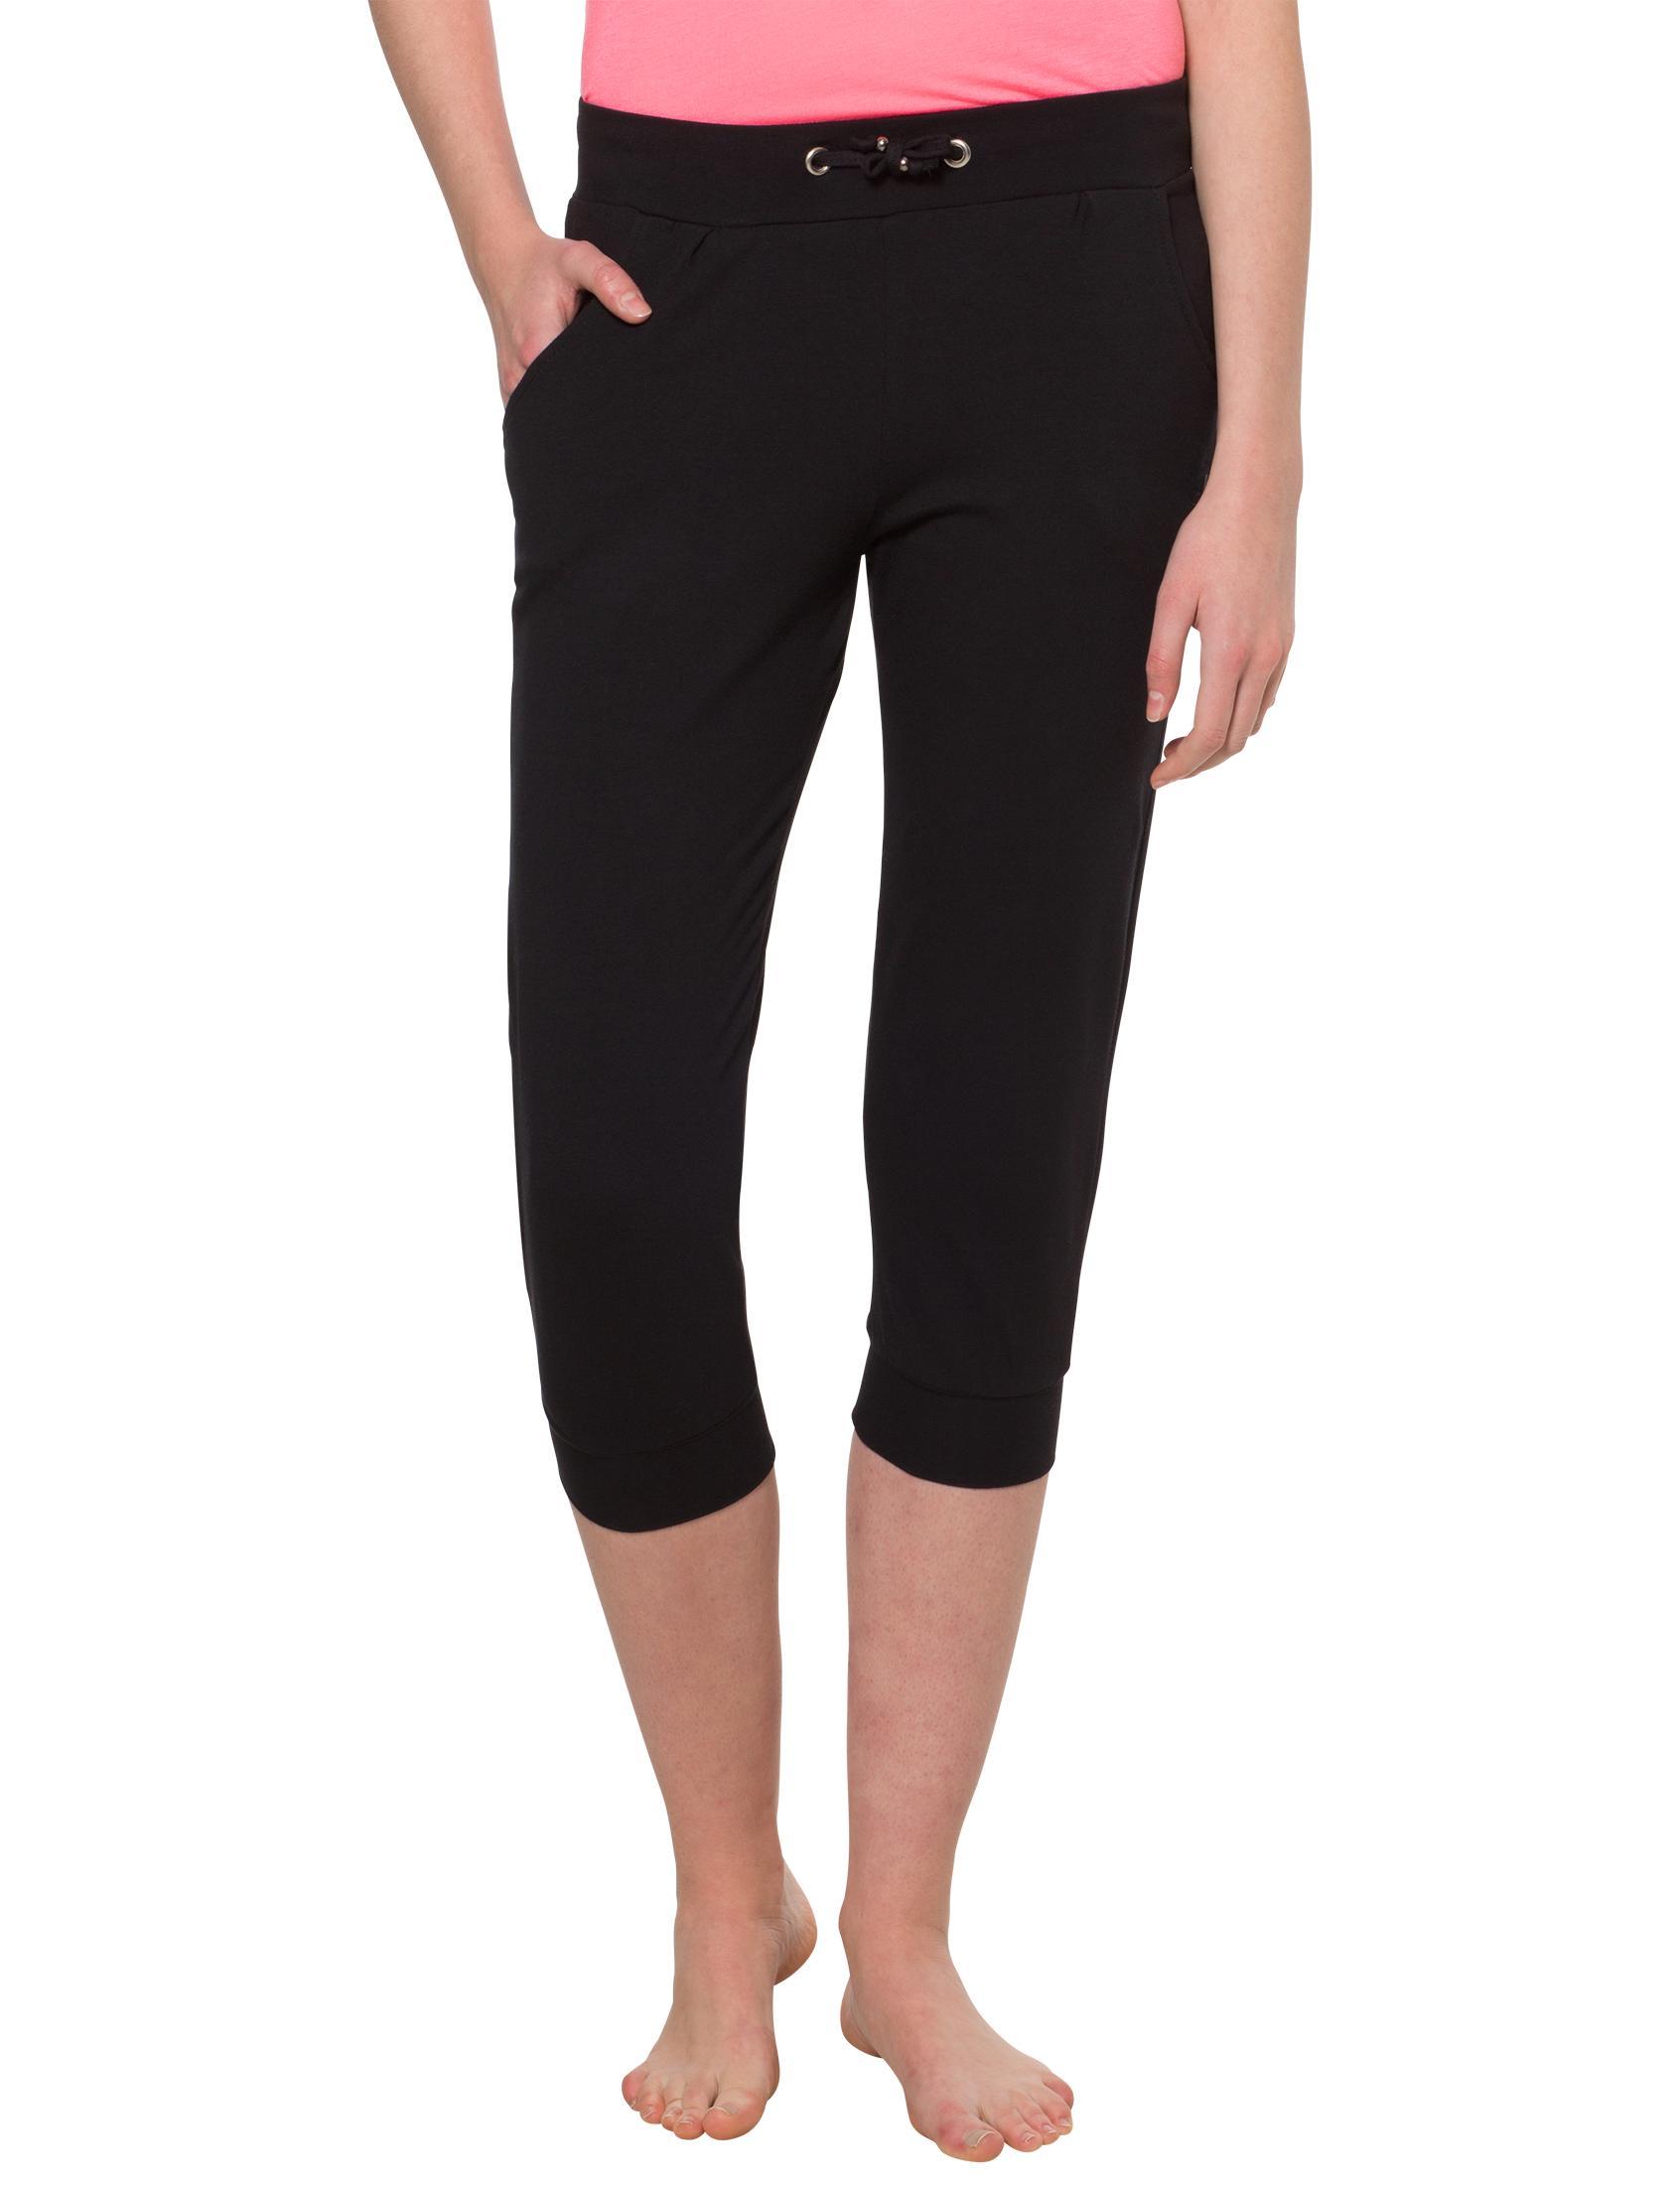 Ultrasport Damen Yogahose Vitalize - Yoga Capri Leggings